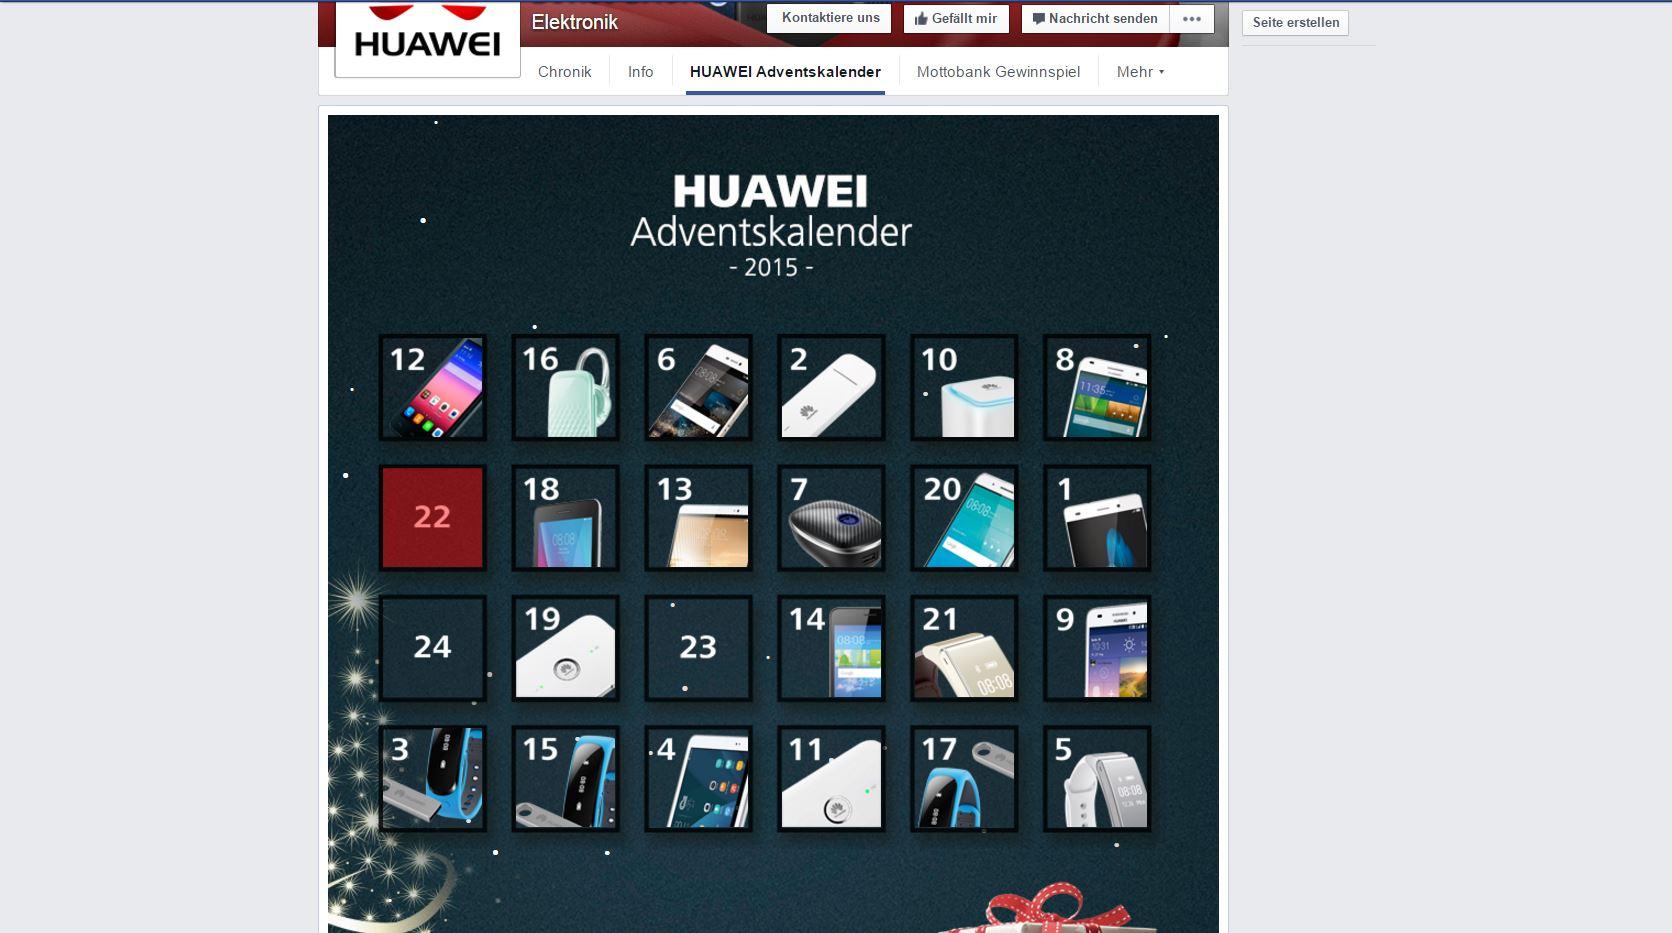 huawei adventskalender facebook adventskalender online adventskalender technik gewinnspiele. Black Bedroom Furniture Sets. Home Design Ideas